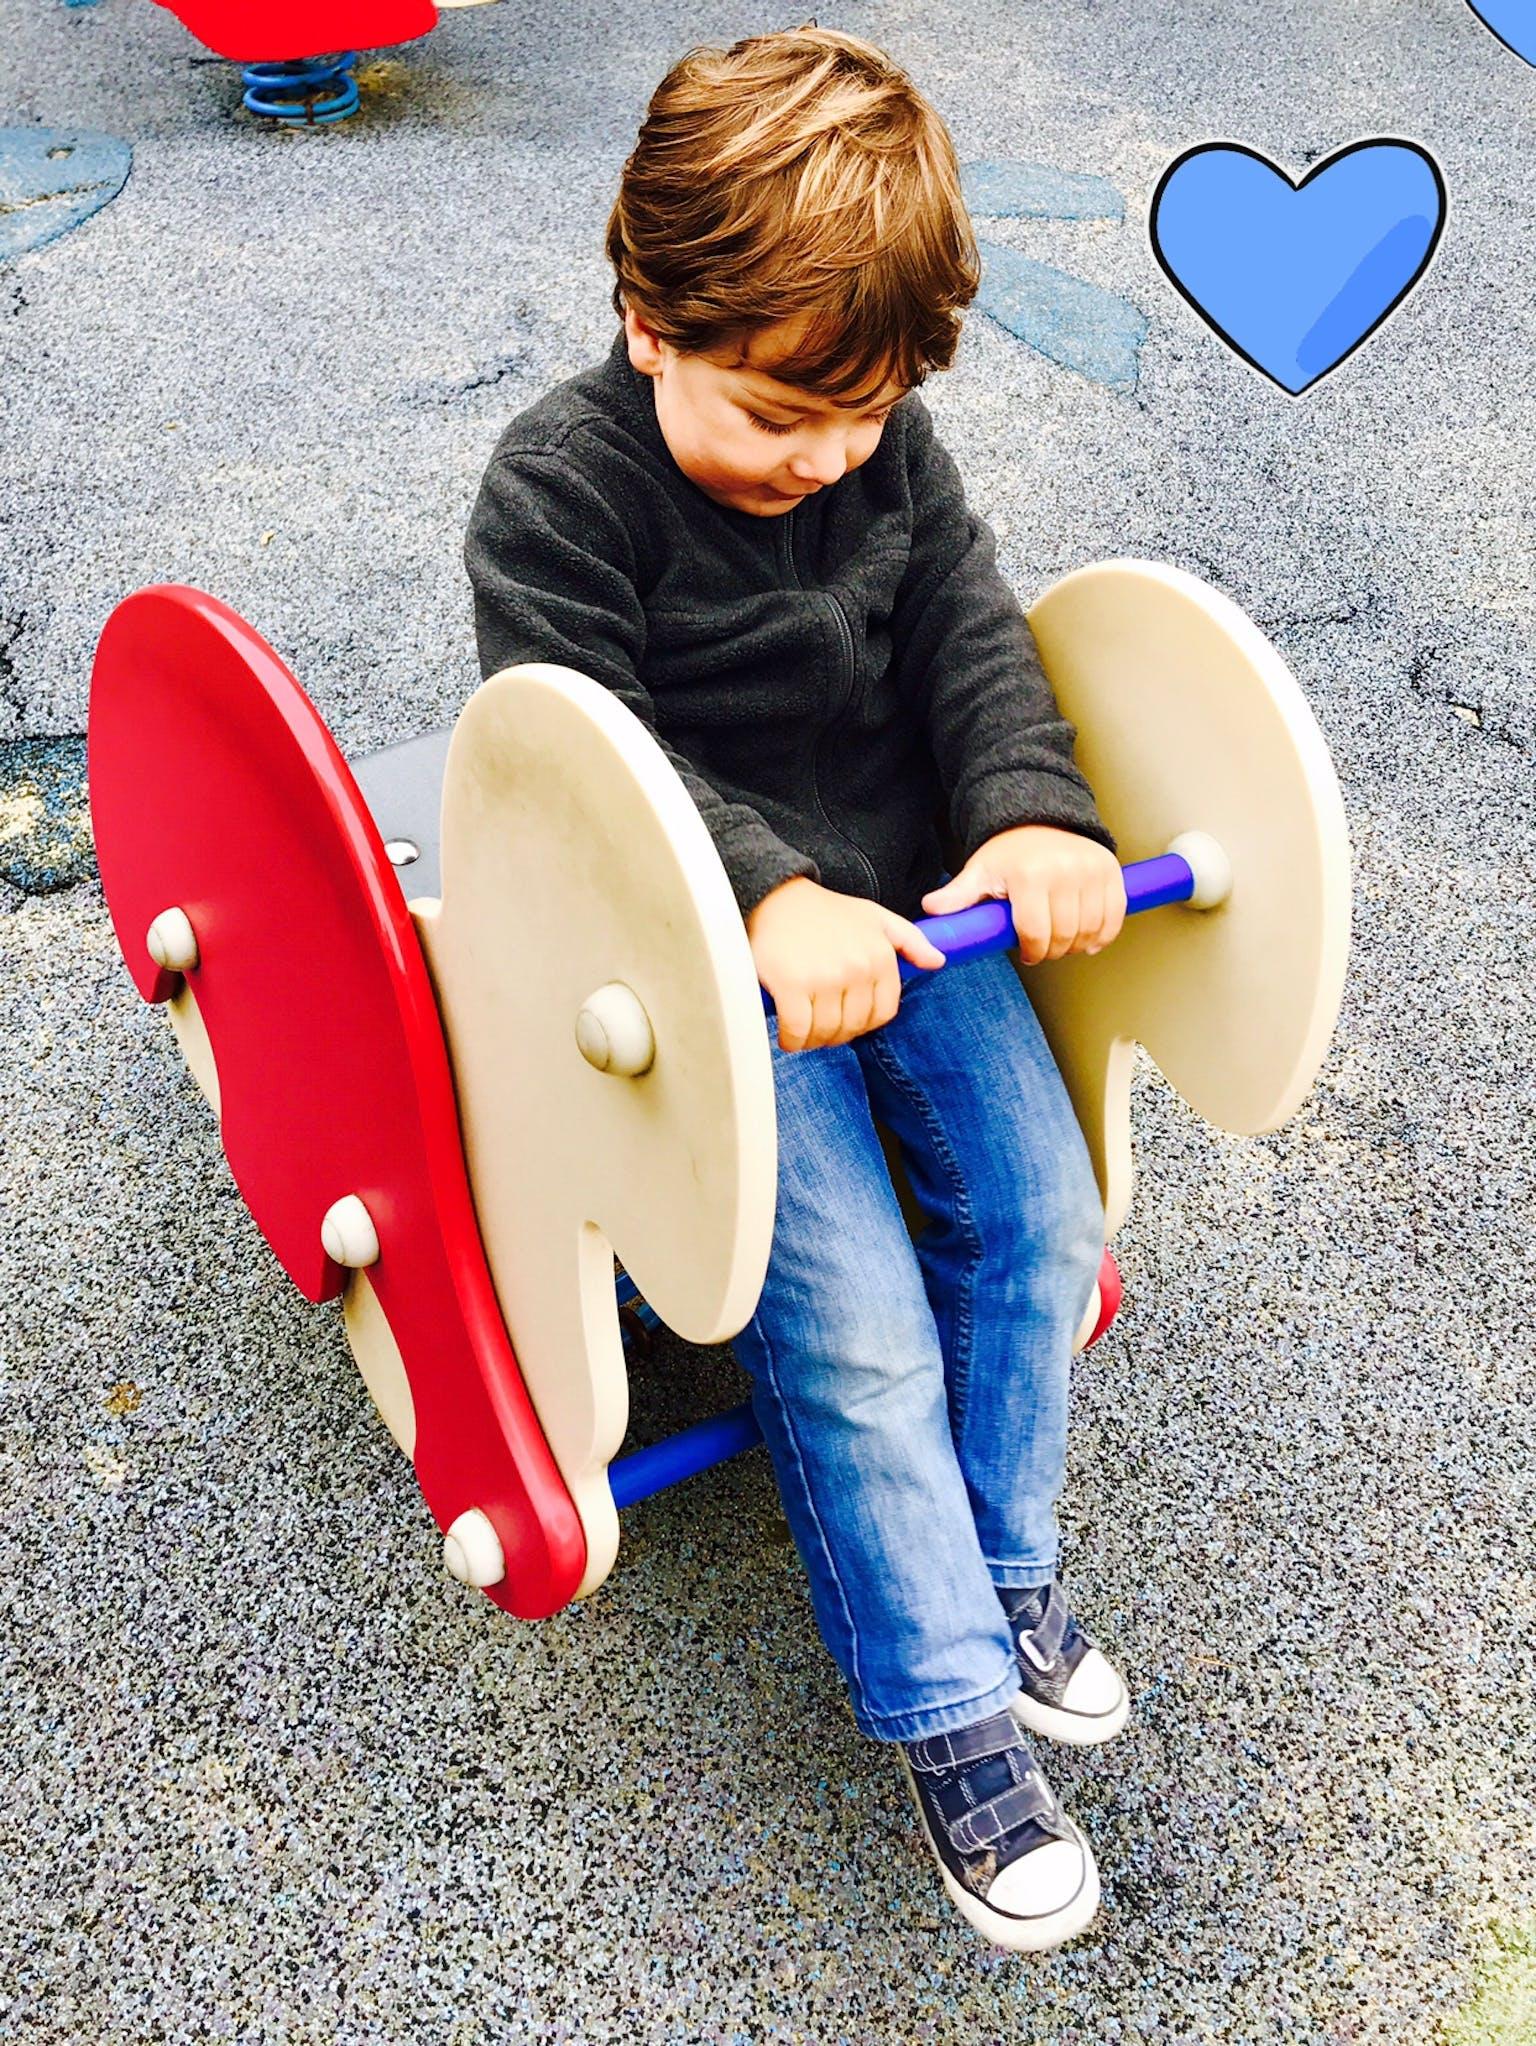 J.P. Murphy Playground in San Francisco, CA